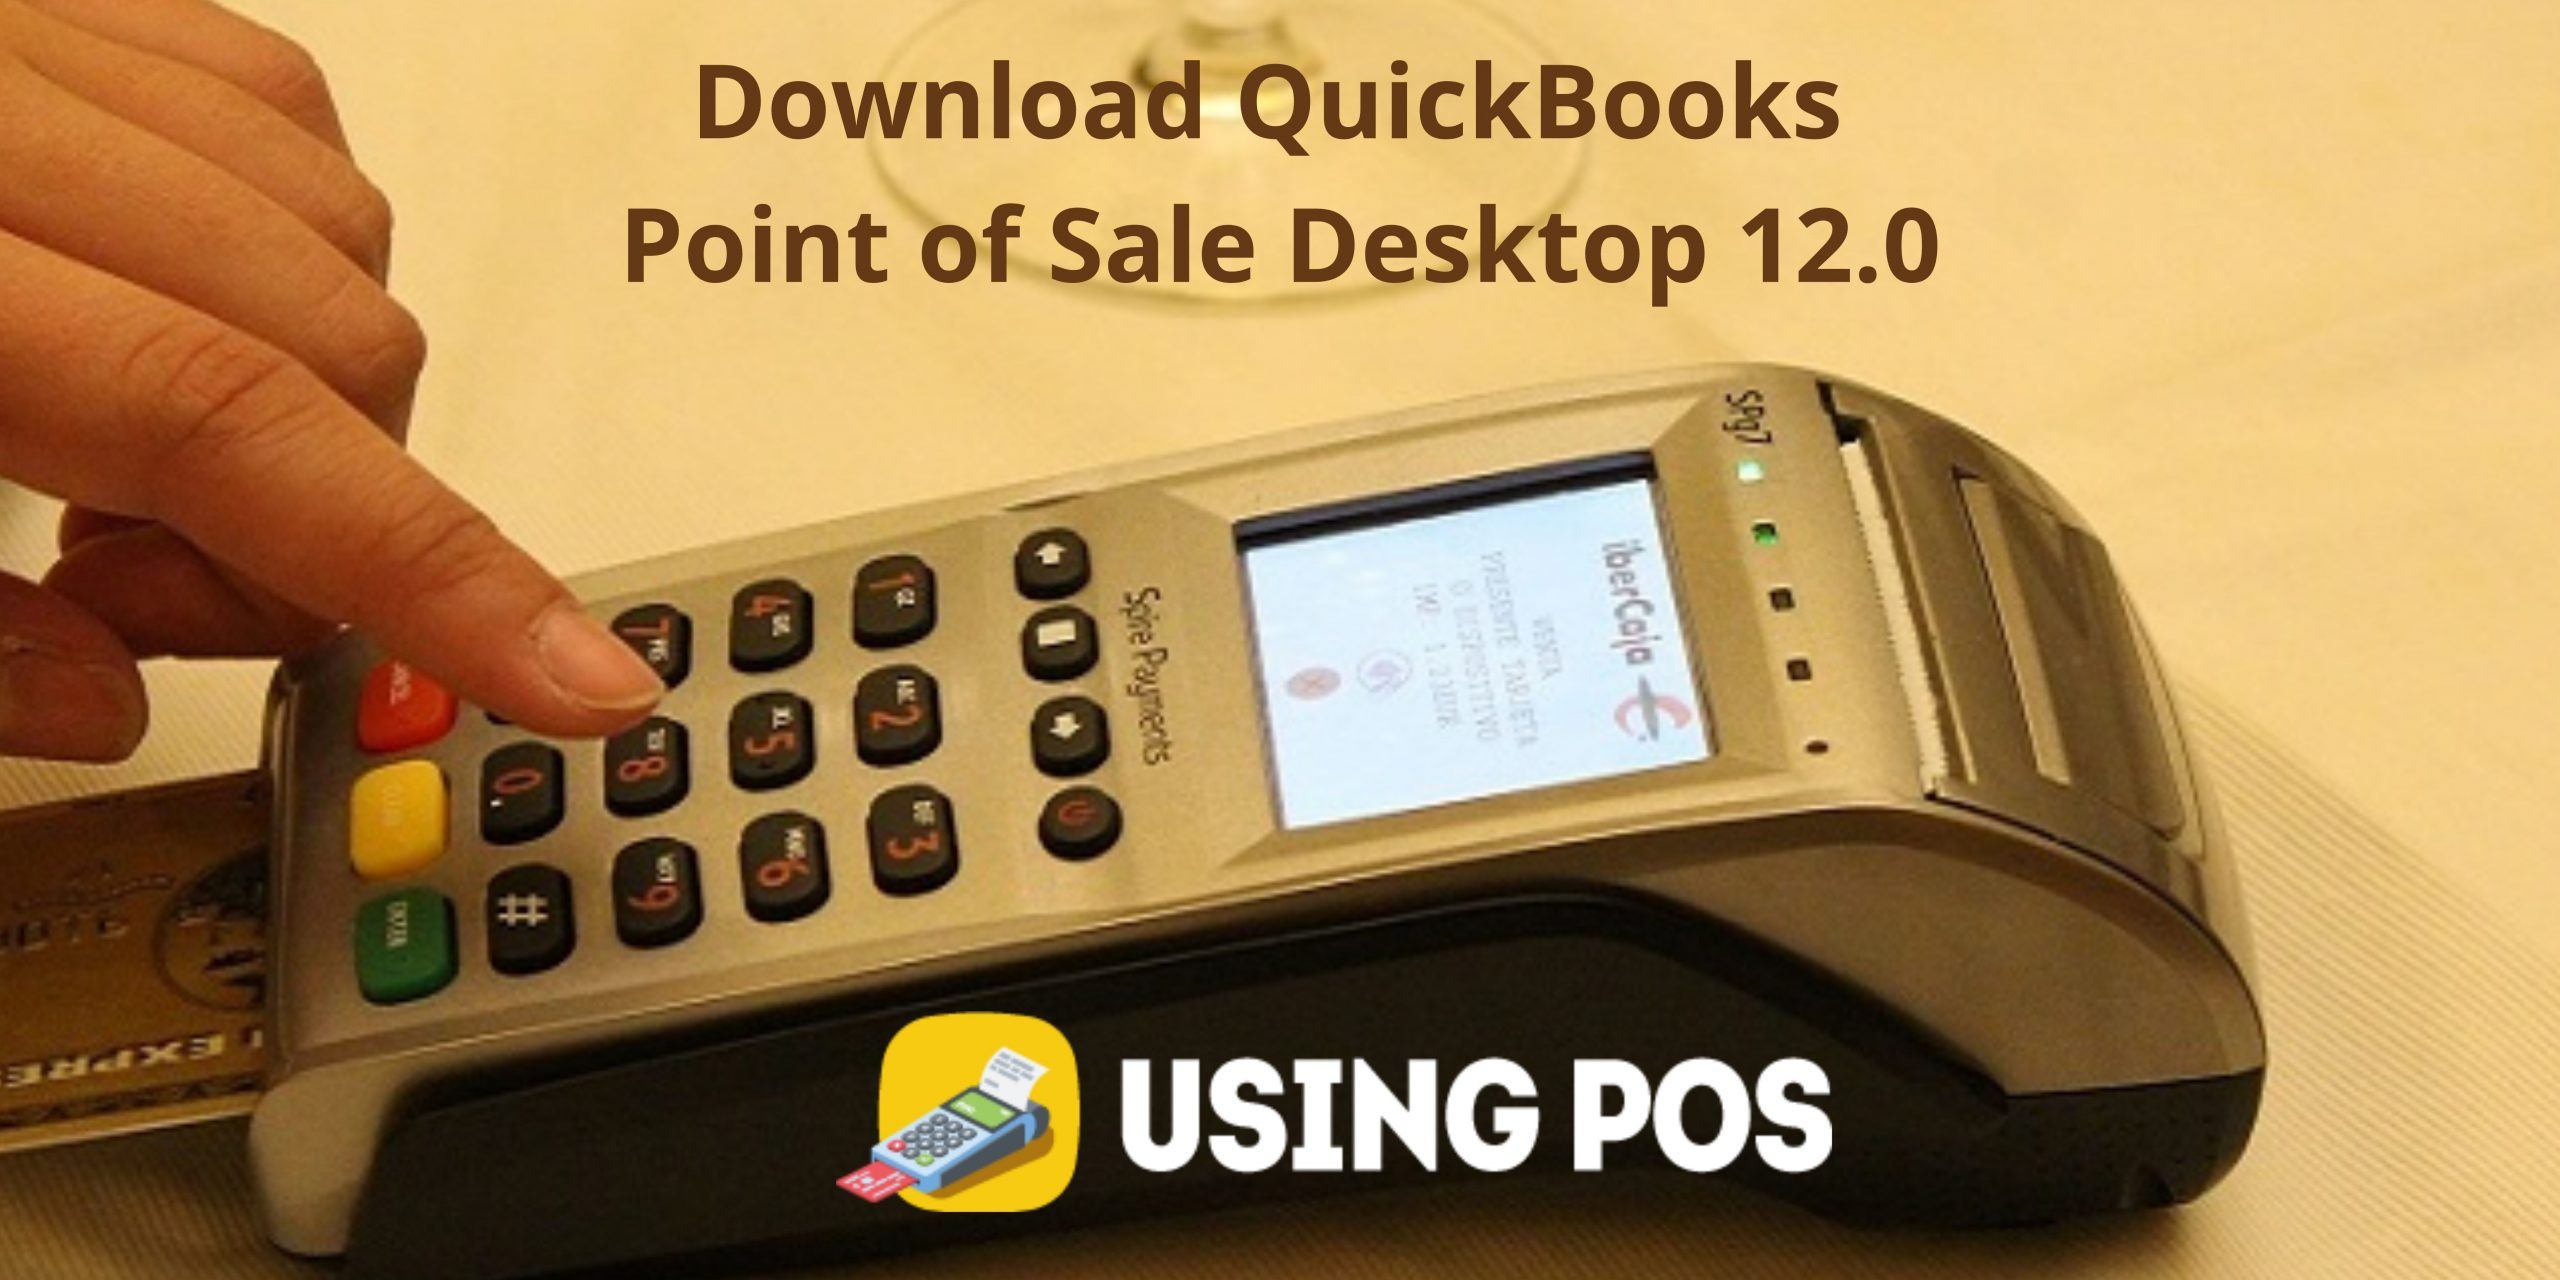 Resolve QuickBooks Point of Sale Desktop 12.0 Download